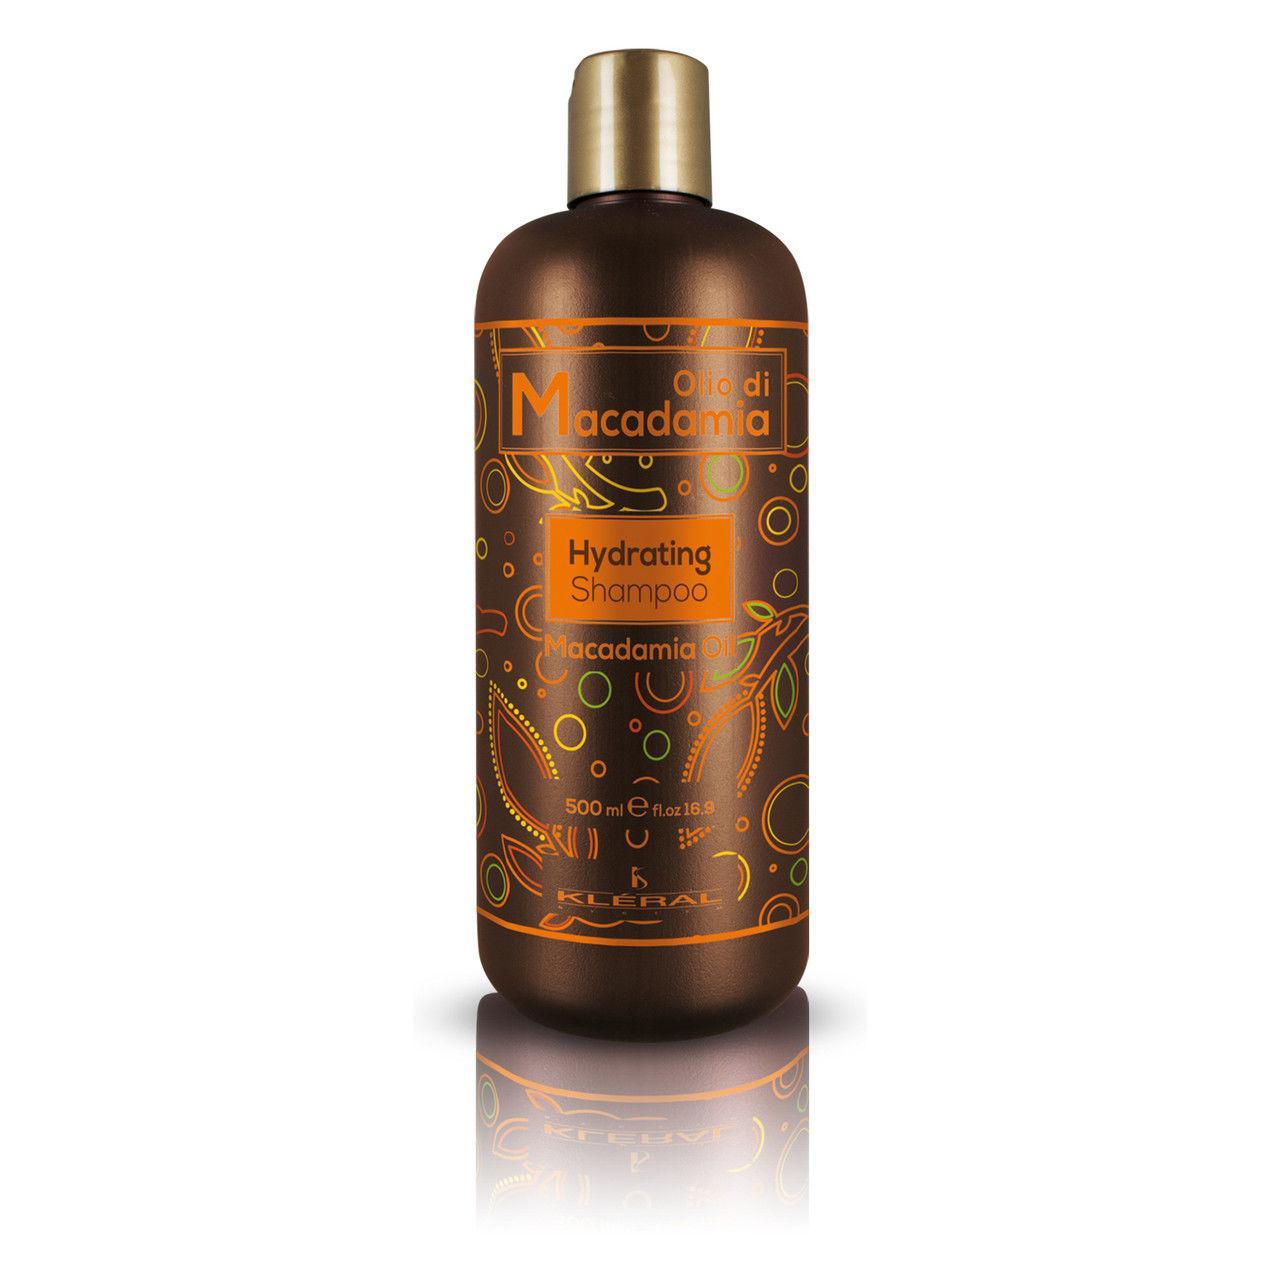 Увлажняющий шампунь с маслом макадамии Kleral System Macadamia Hydrating Shampoo, 500 мл